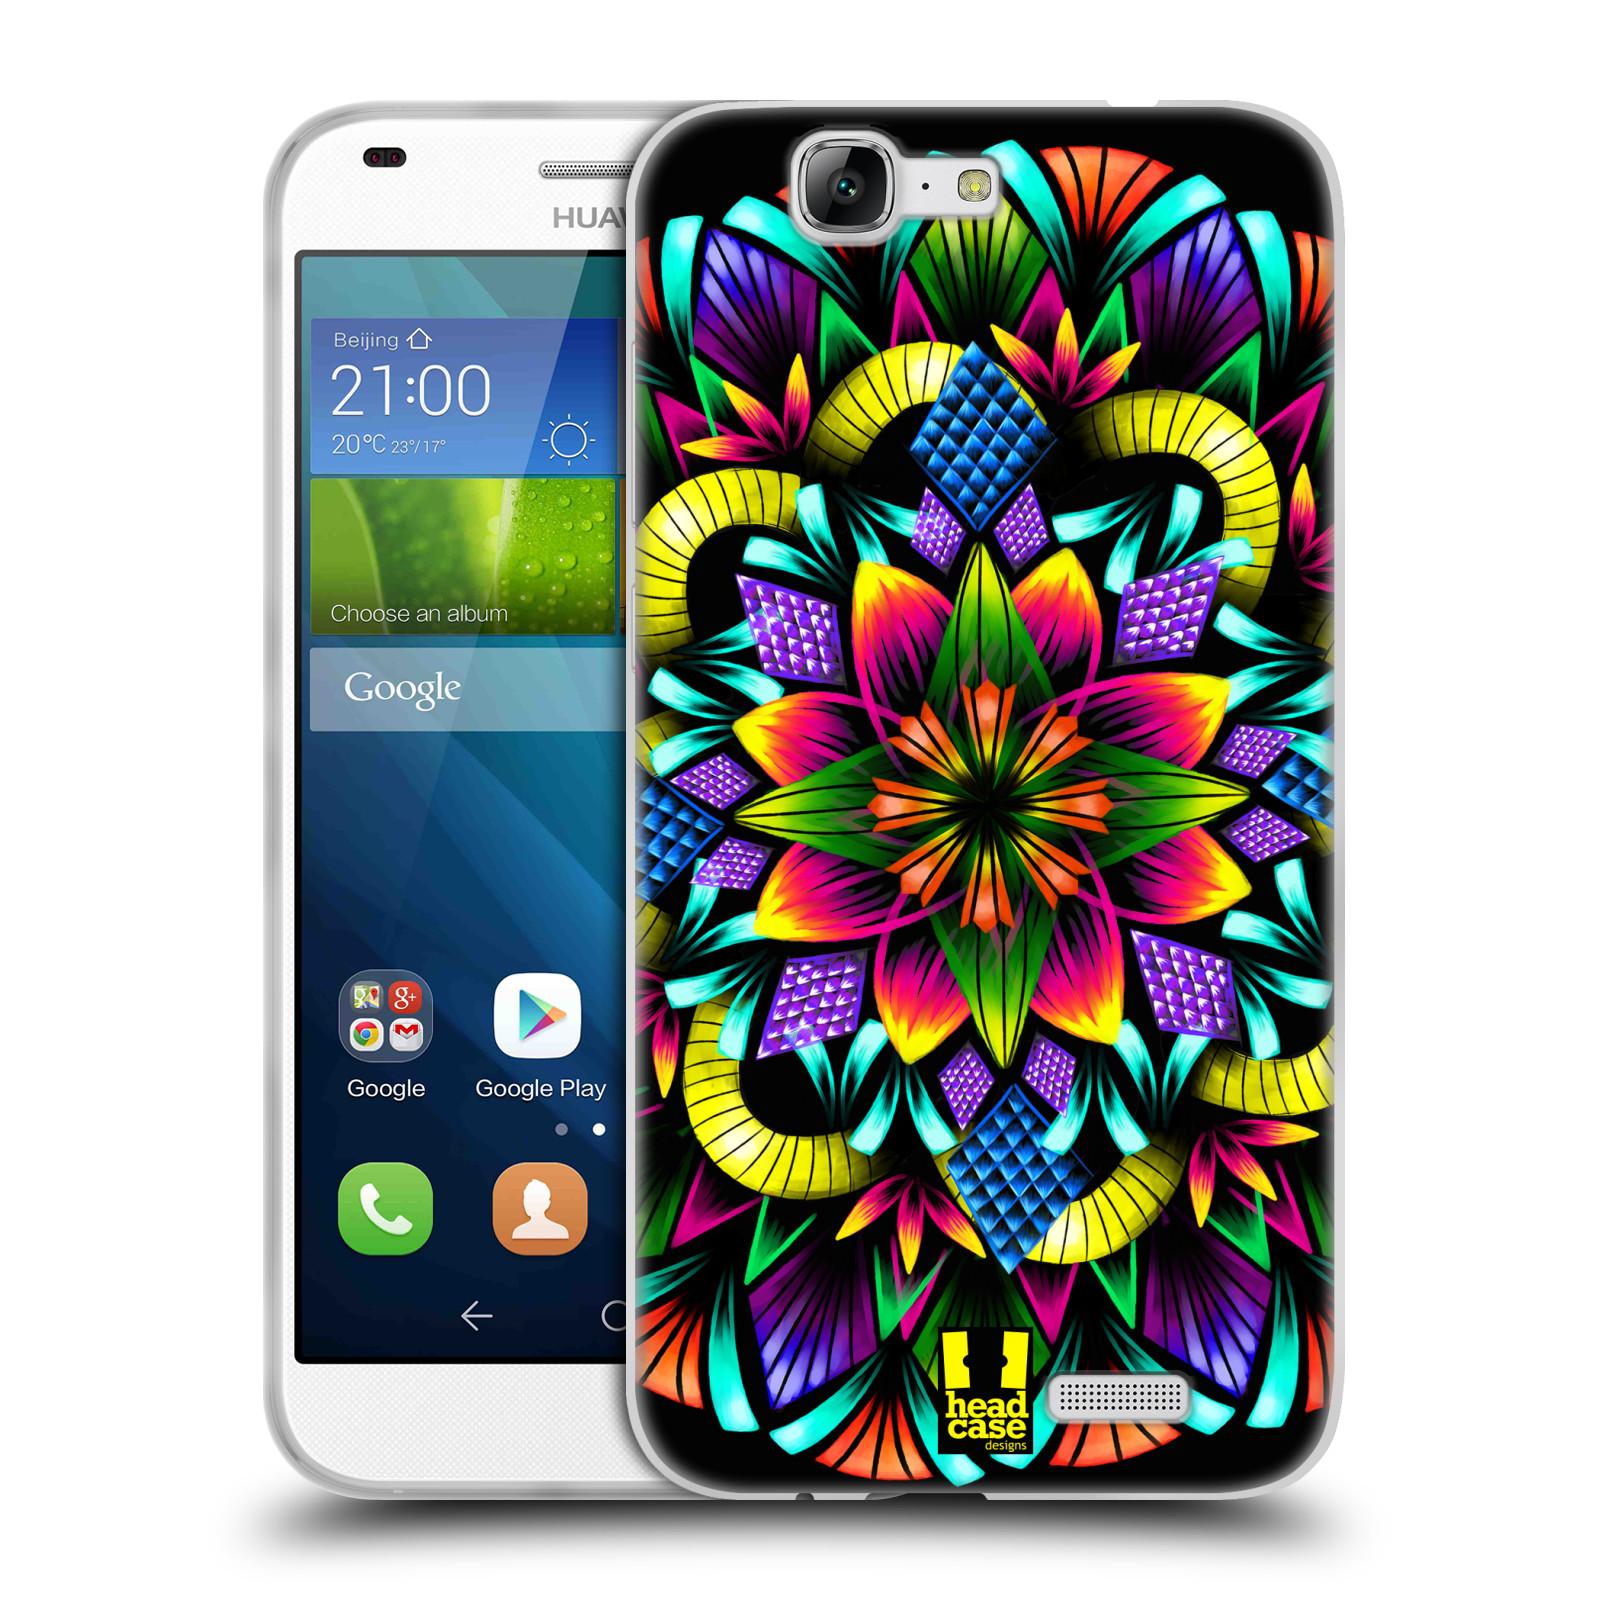 Silikonové pouzdro na mobil Huawei Ascend G7 HEAD CASE Květina mandala